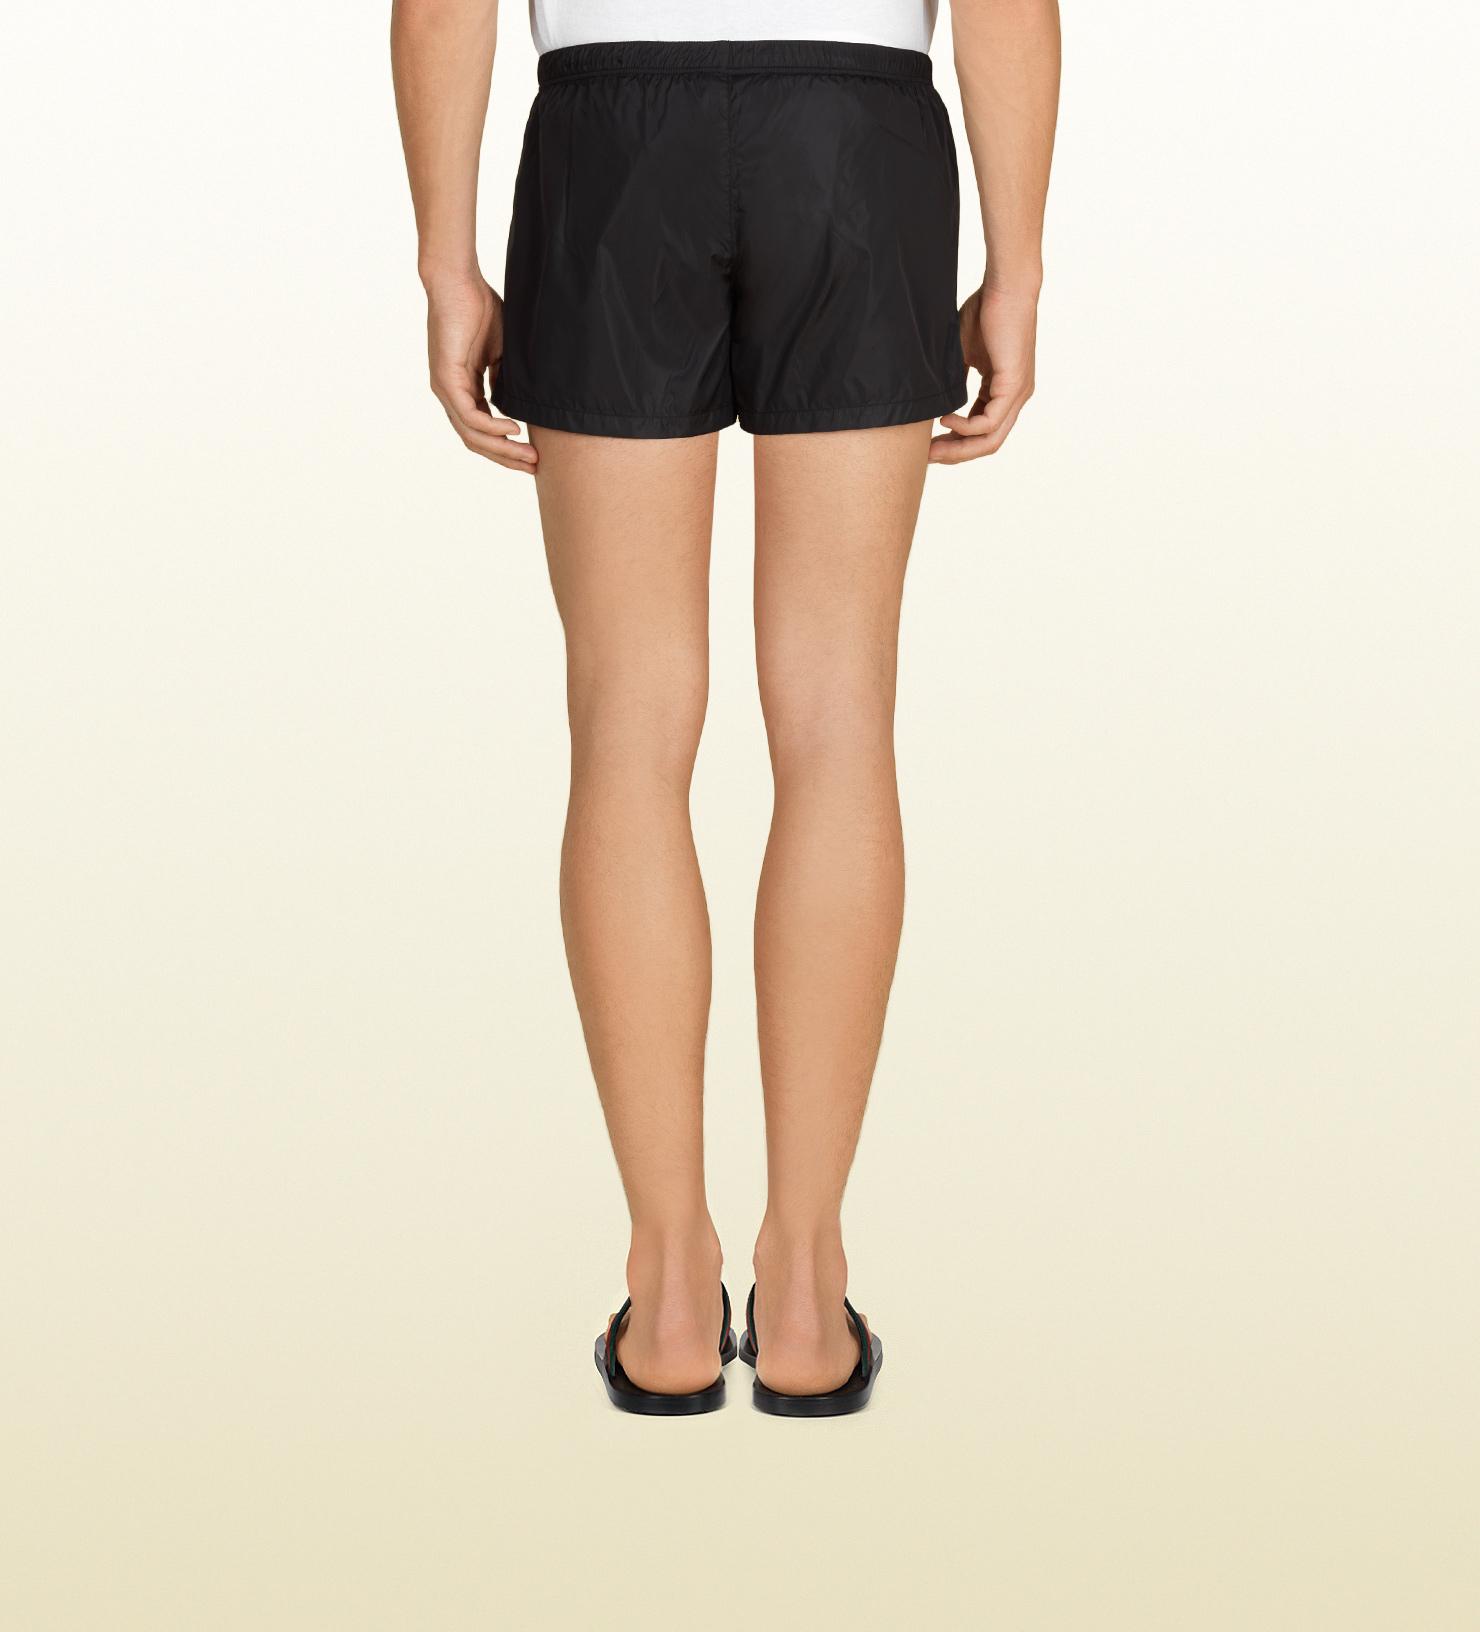 70cc787c28f Gucci Black Nylon Swim Short in Black for Men - Lyst